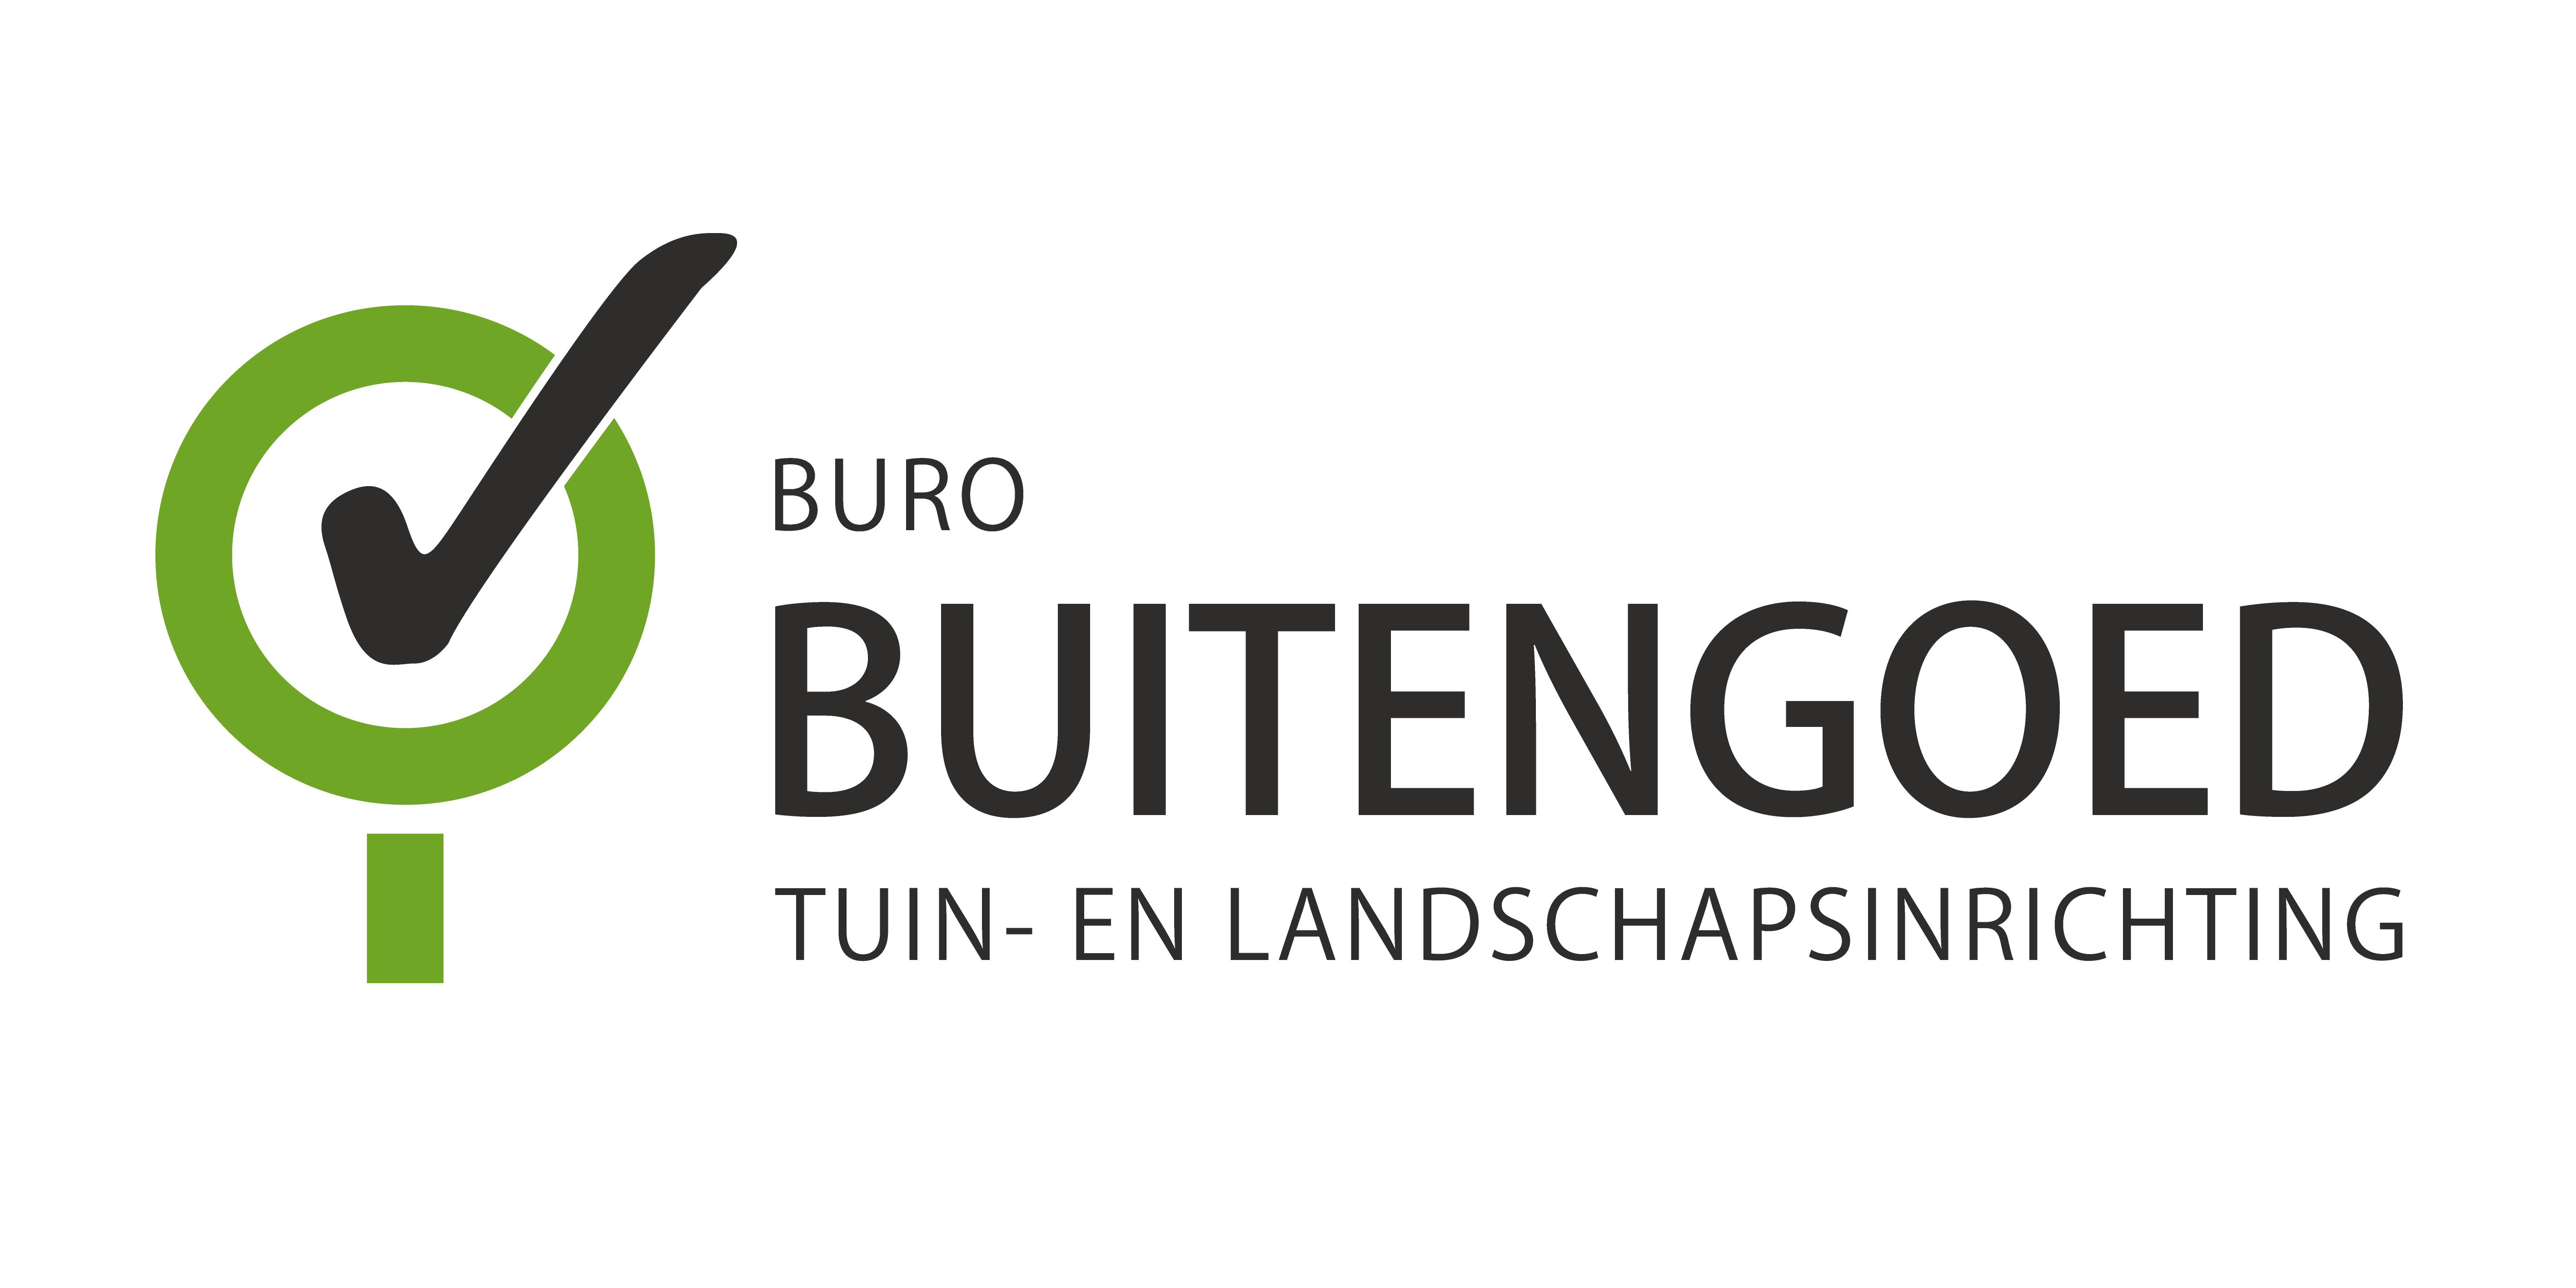 Buro-Buitengoed